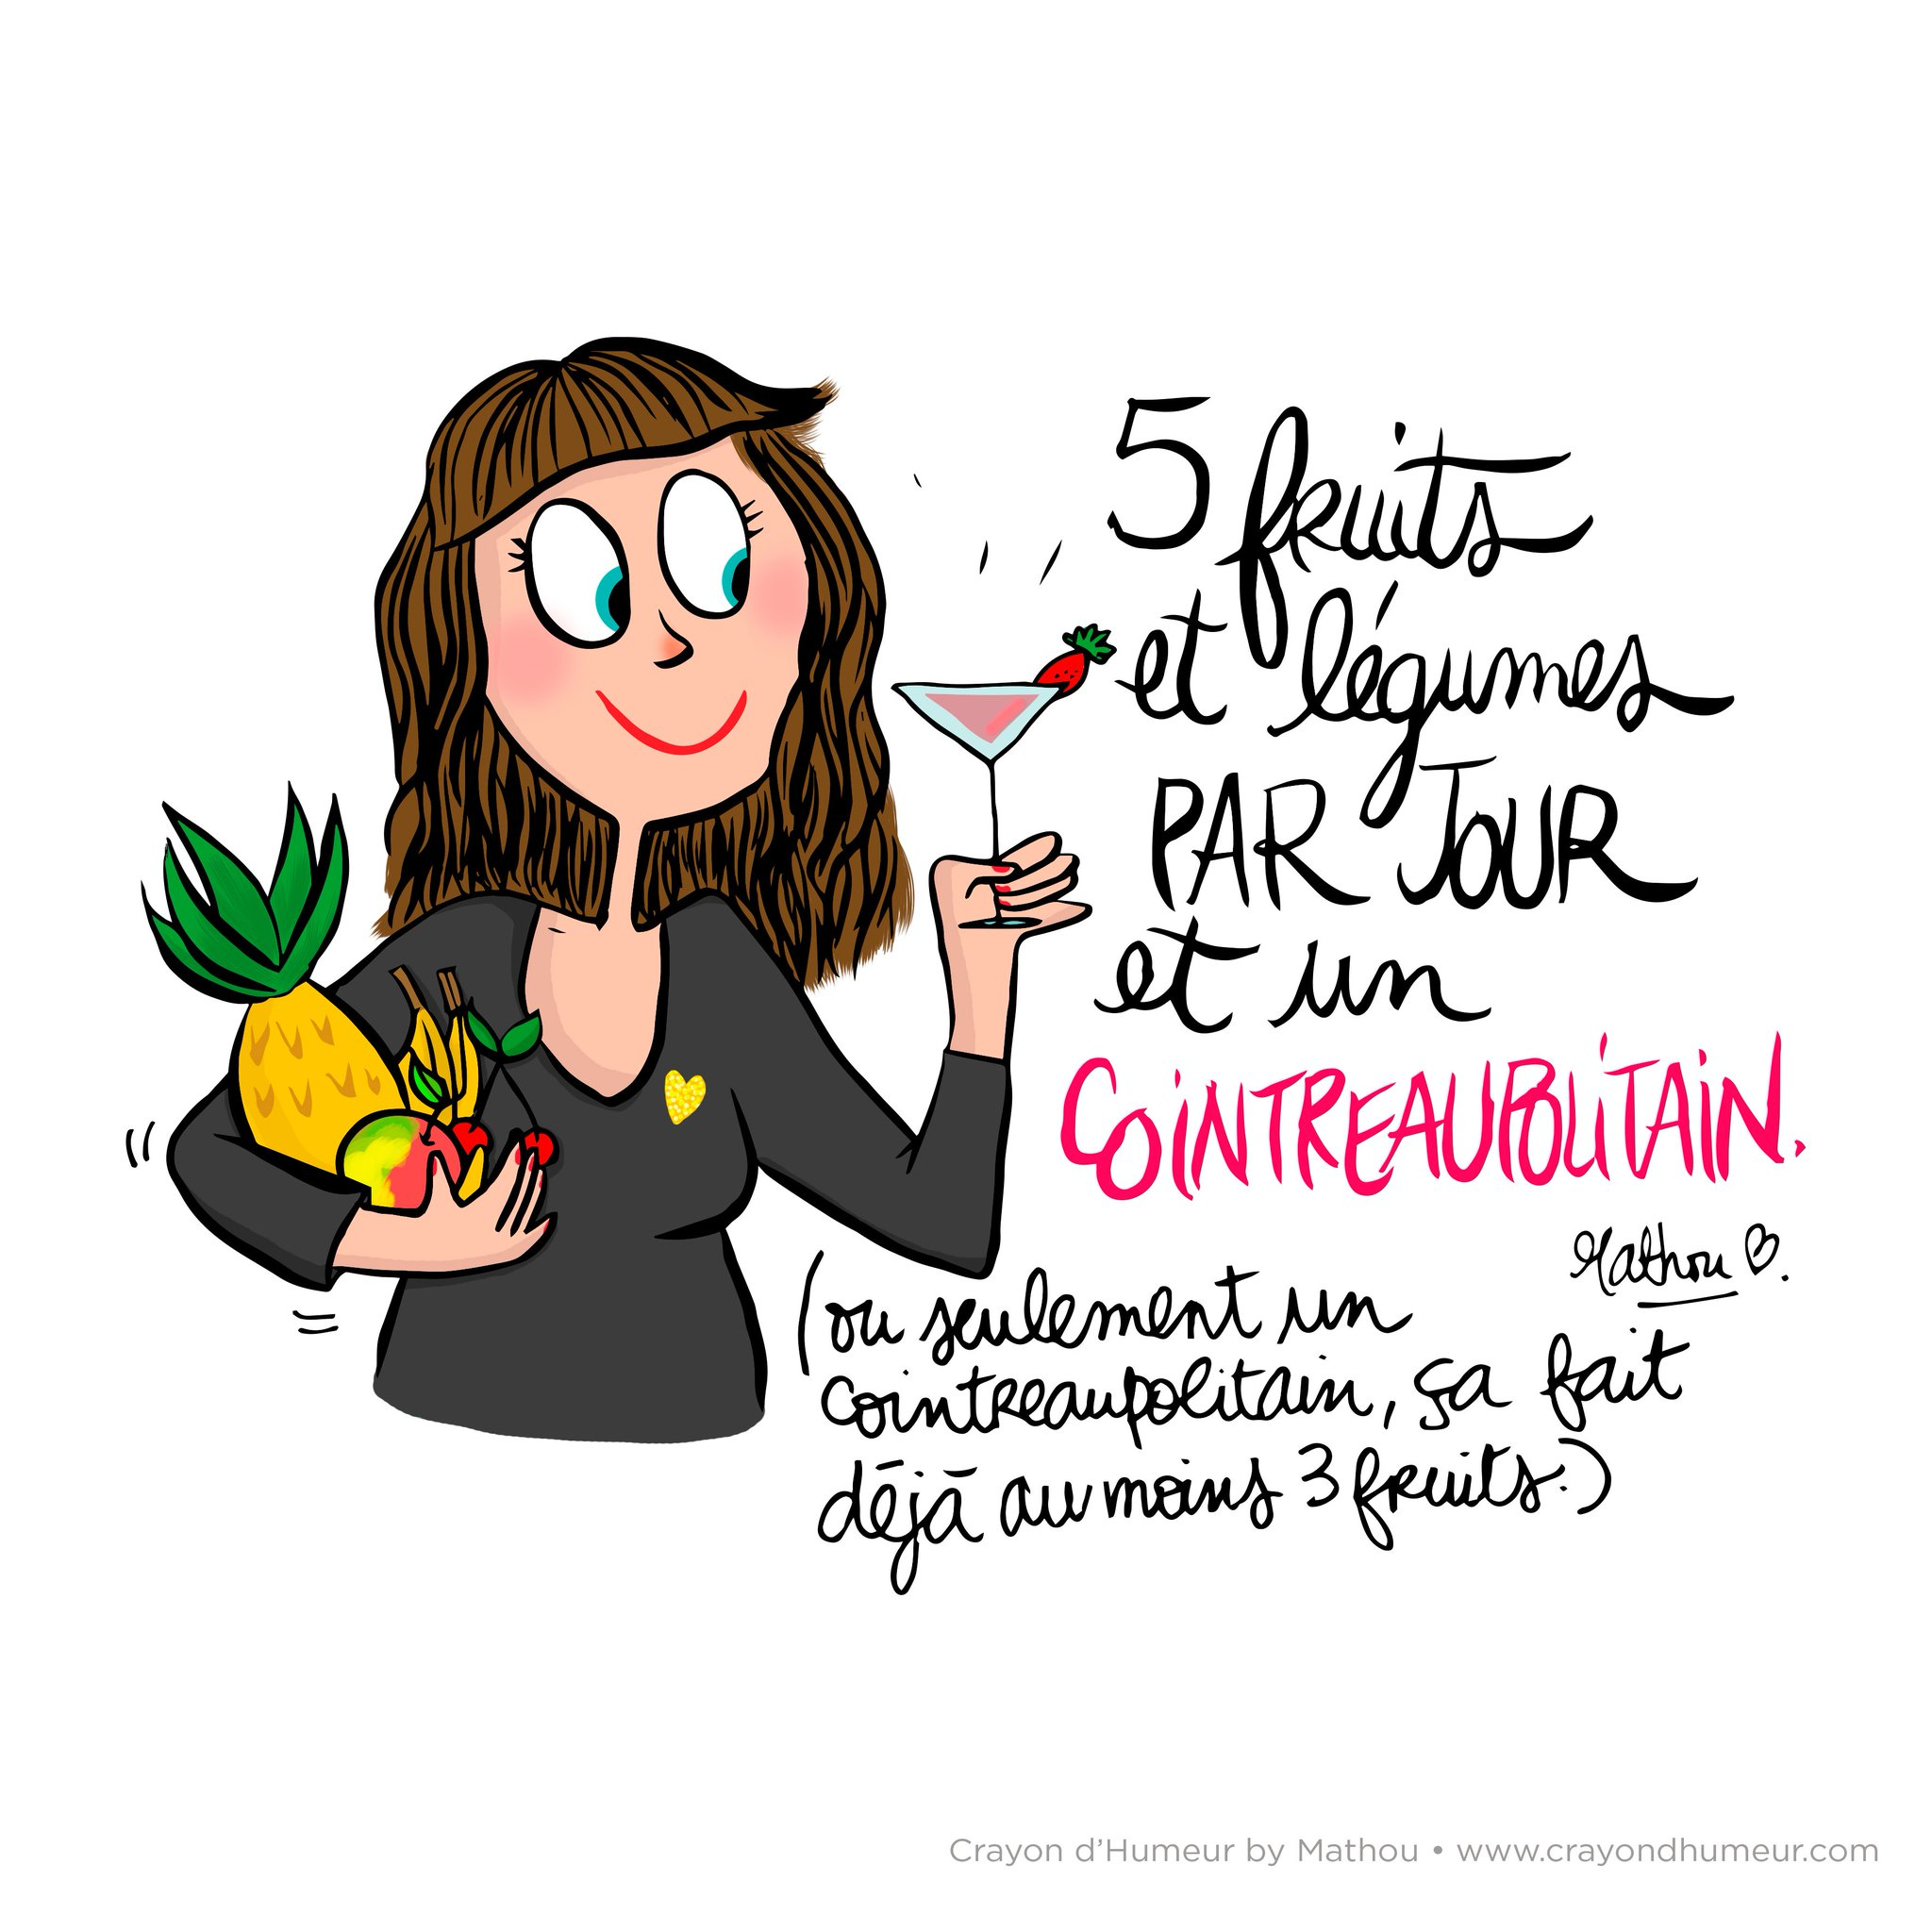 Mathou virfollet on twitter cocktail mathou crayondhumeur illustration dessin - Dessin cocktail ...